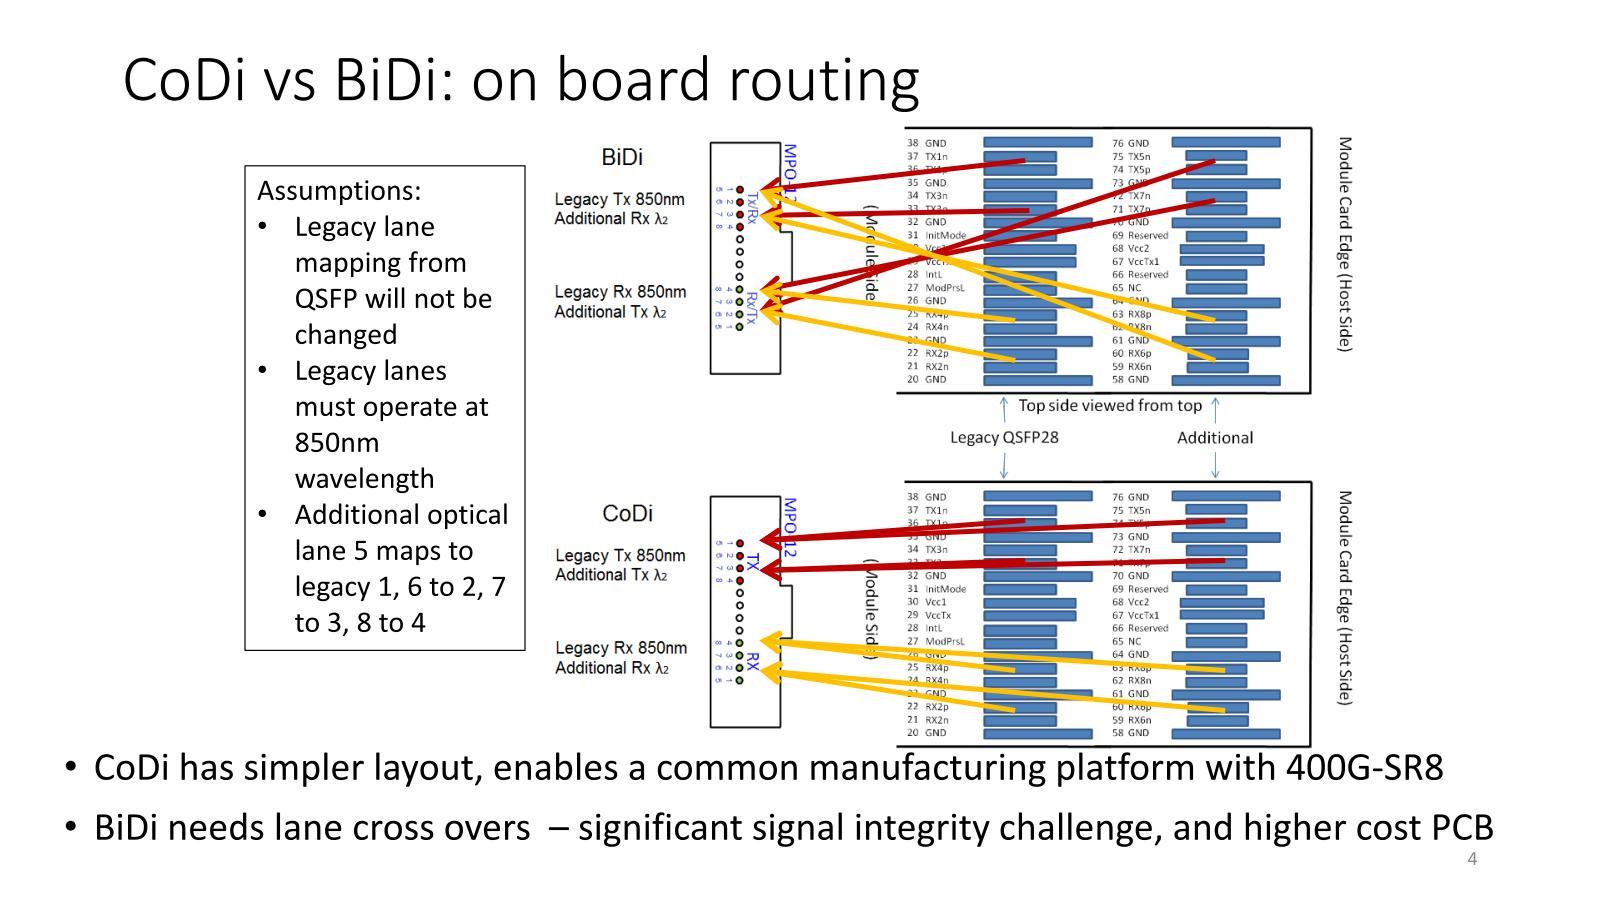 400G-BD4.2が上のBiDi型。一方CoDiは送信側と受信側の分離により、信号のクロストークを削減できるとするもの